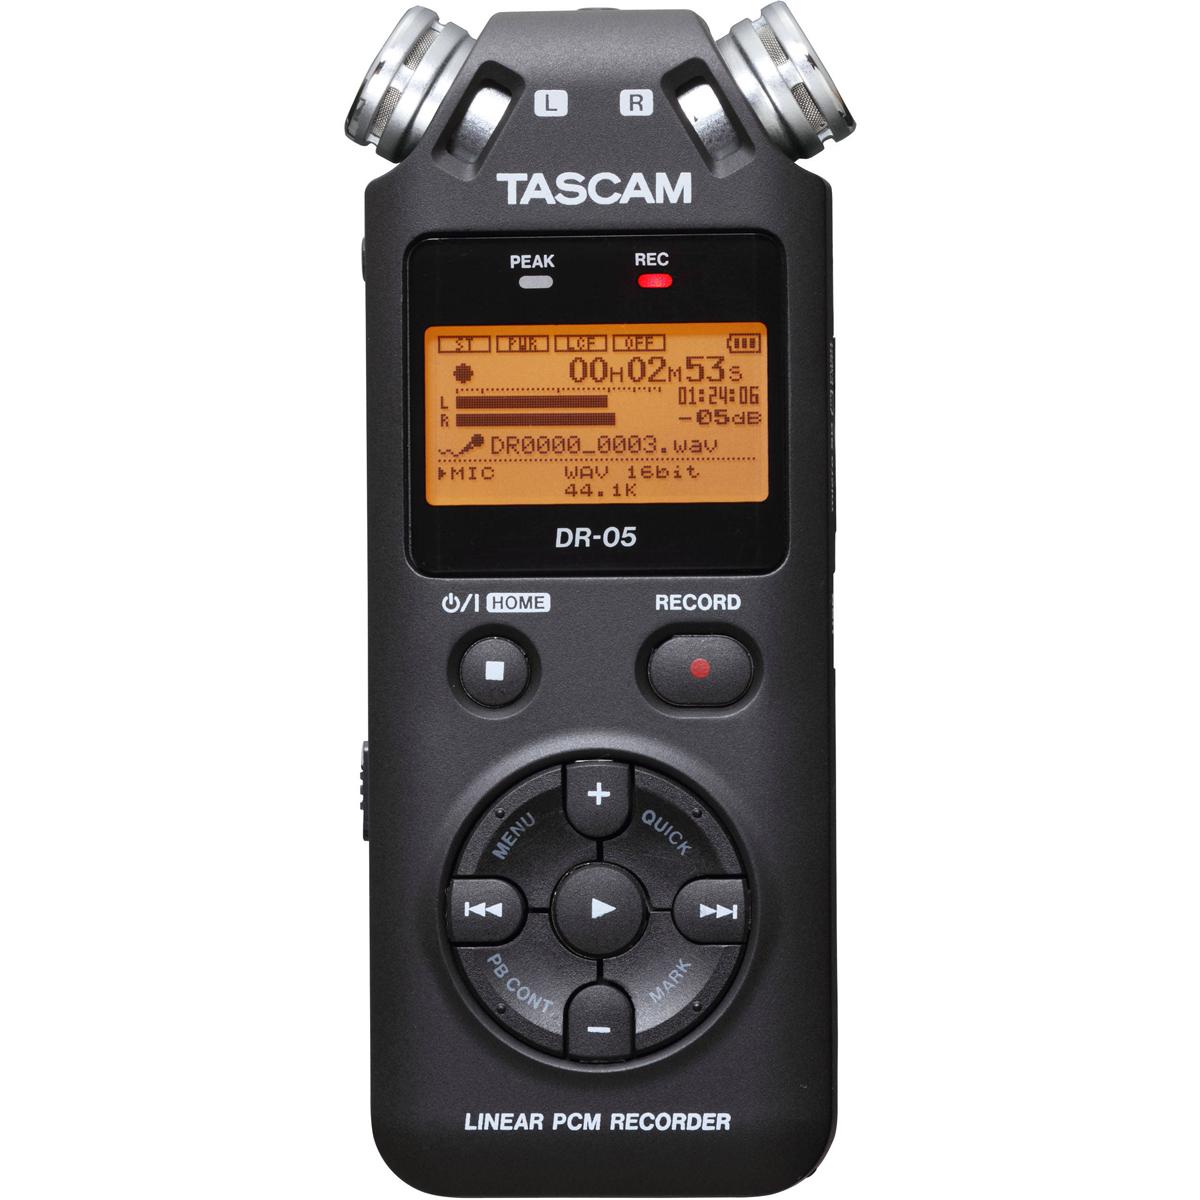 Tư vấn mua Máy ghi âm Tascam DR-05